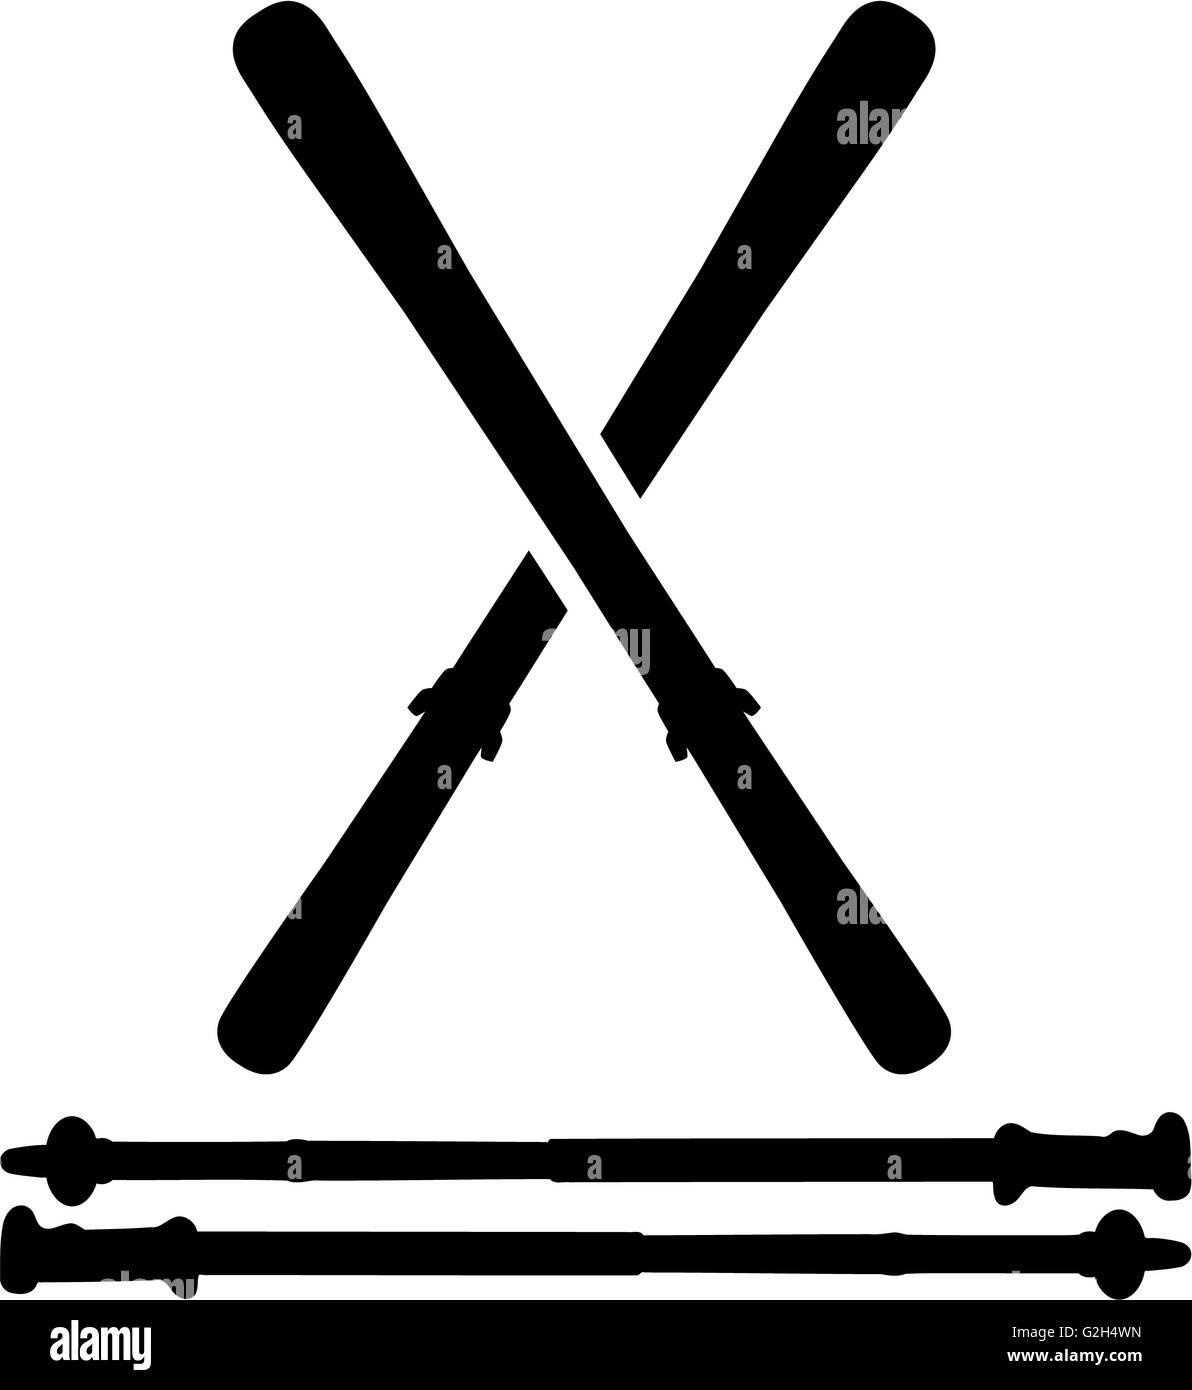 Skis with Ski Sticks - Stock Image